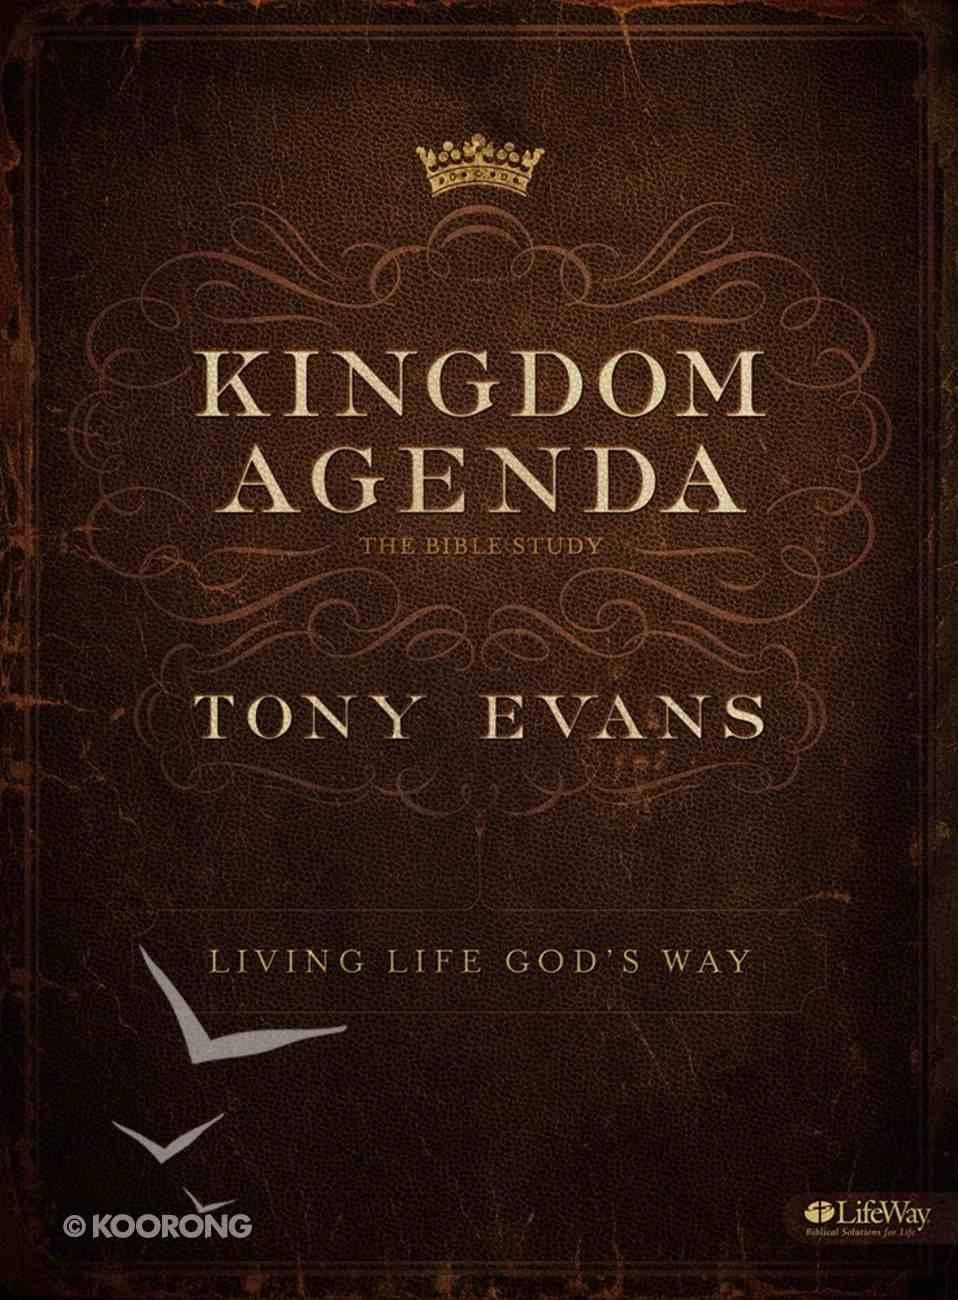 Kingdom Agenda - Living Life God's Way (6 Sessions) (Member Book) Paperback